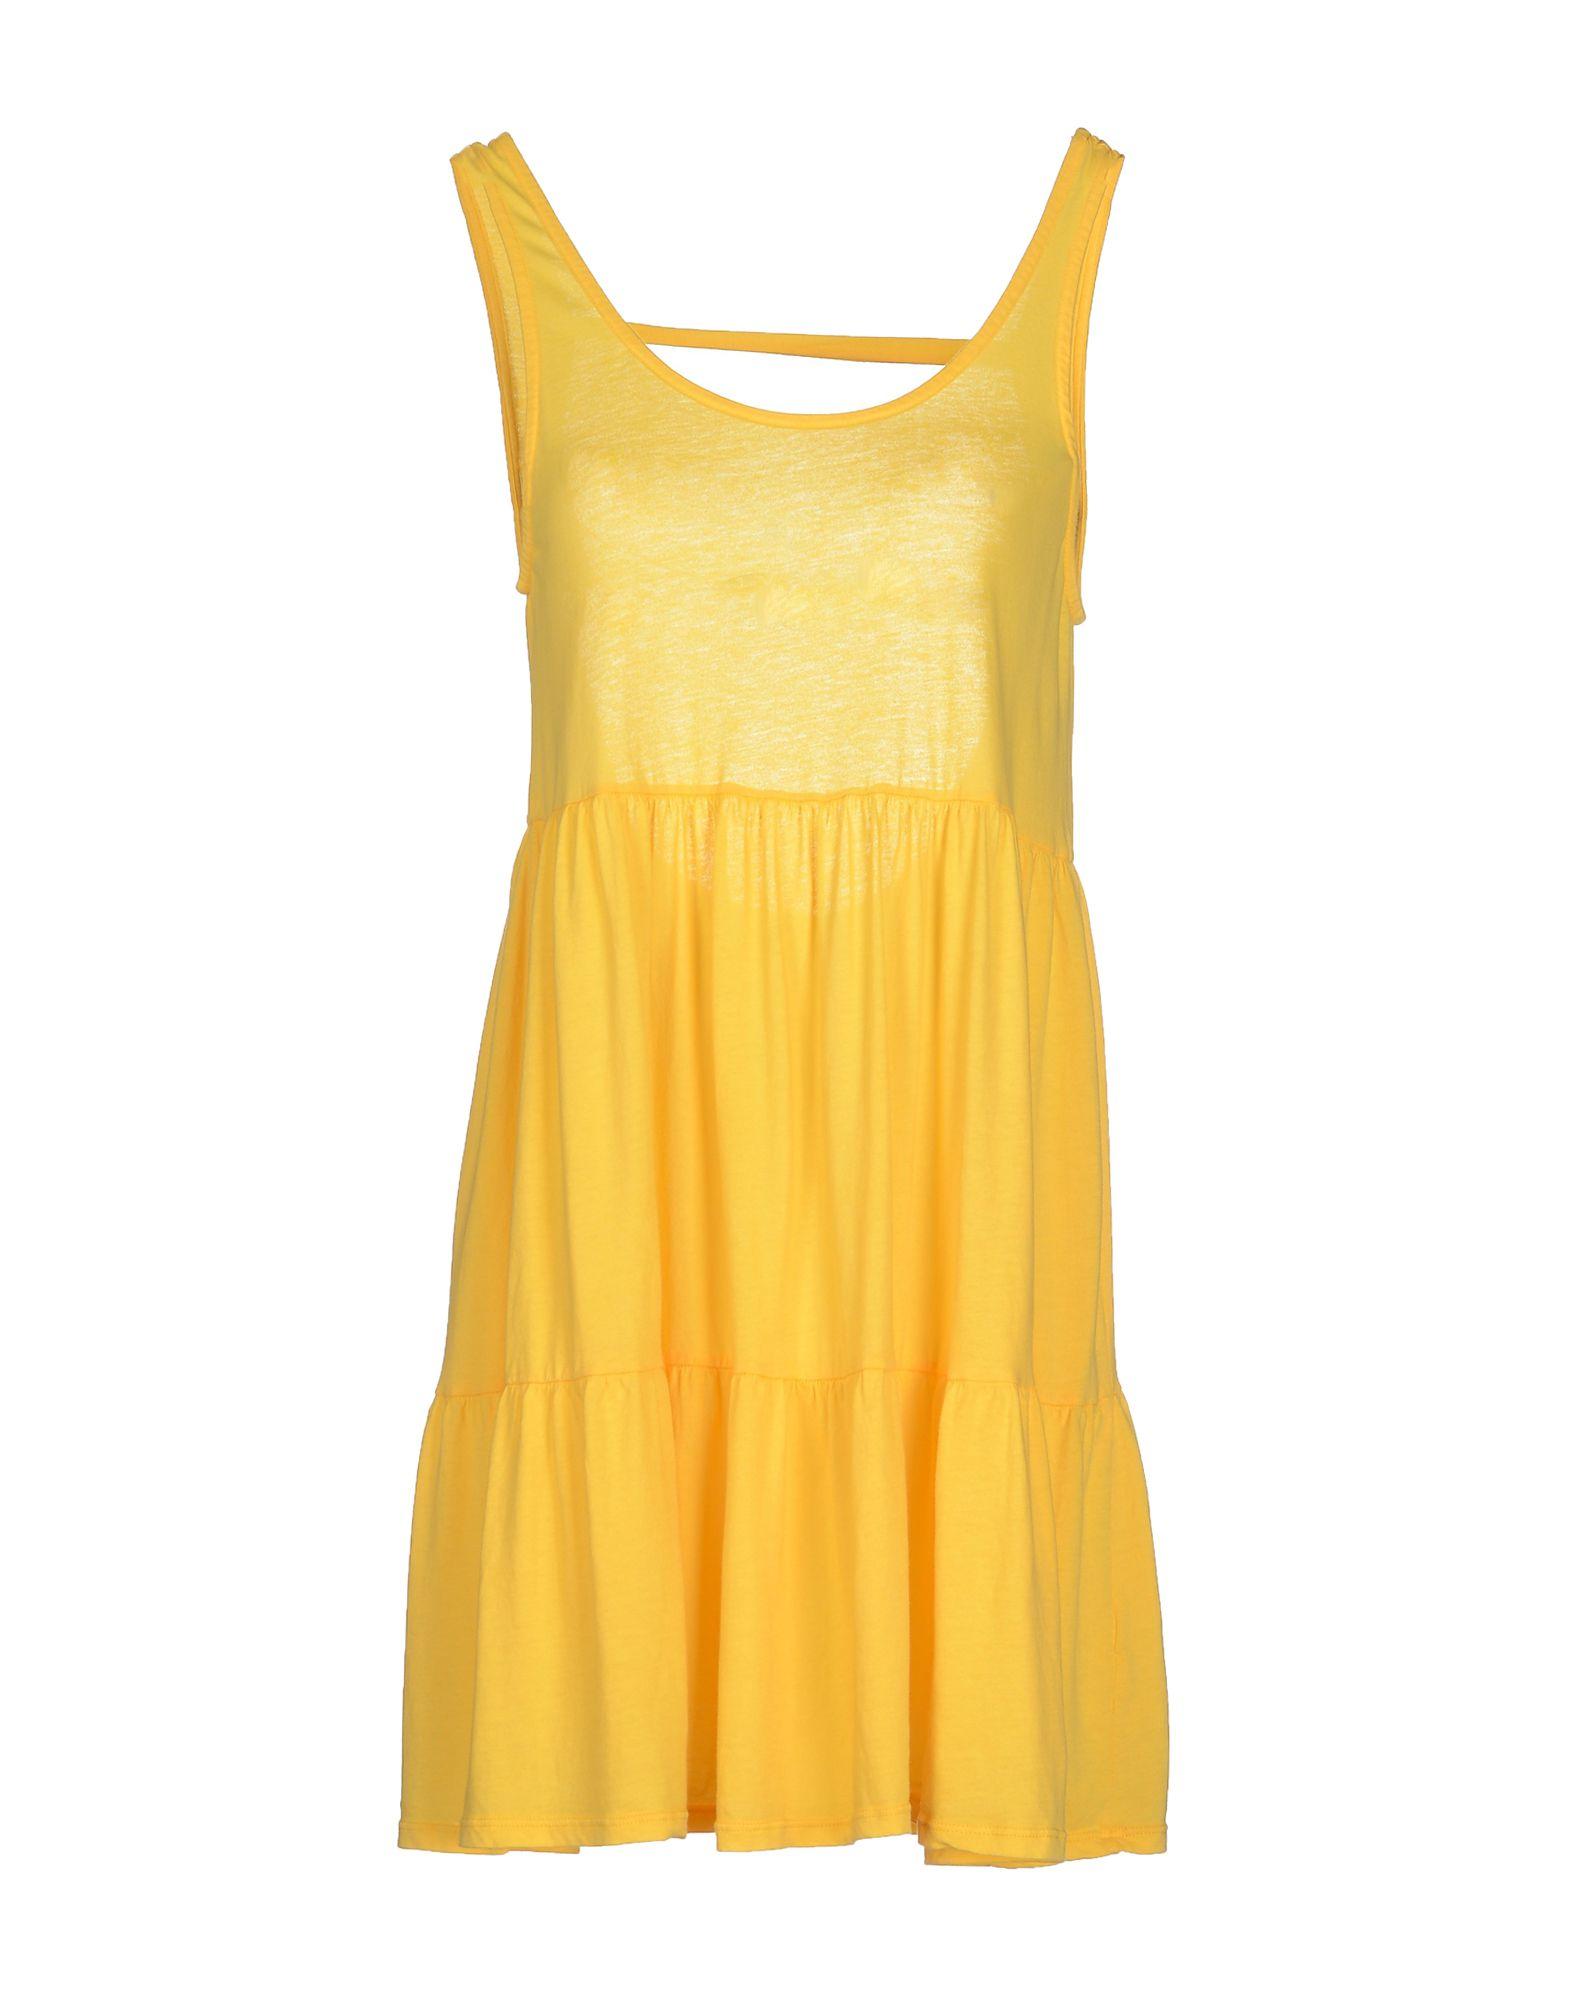 BOBI Damen Kurzes Kleid Farbe Gelb Größe 4